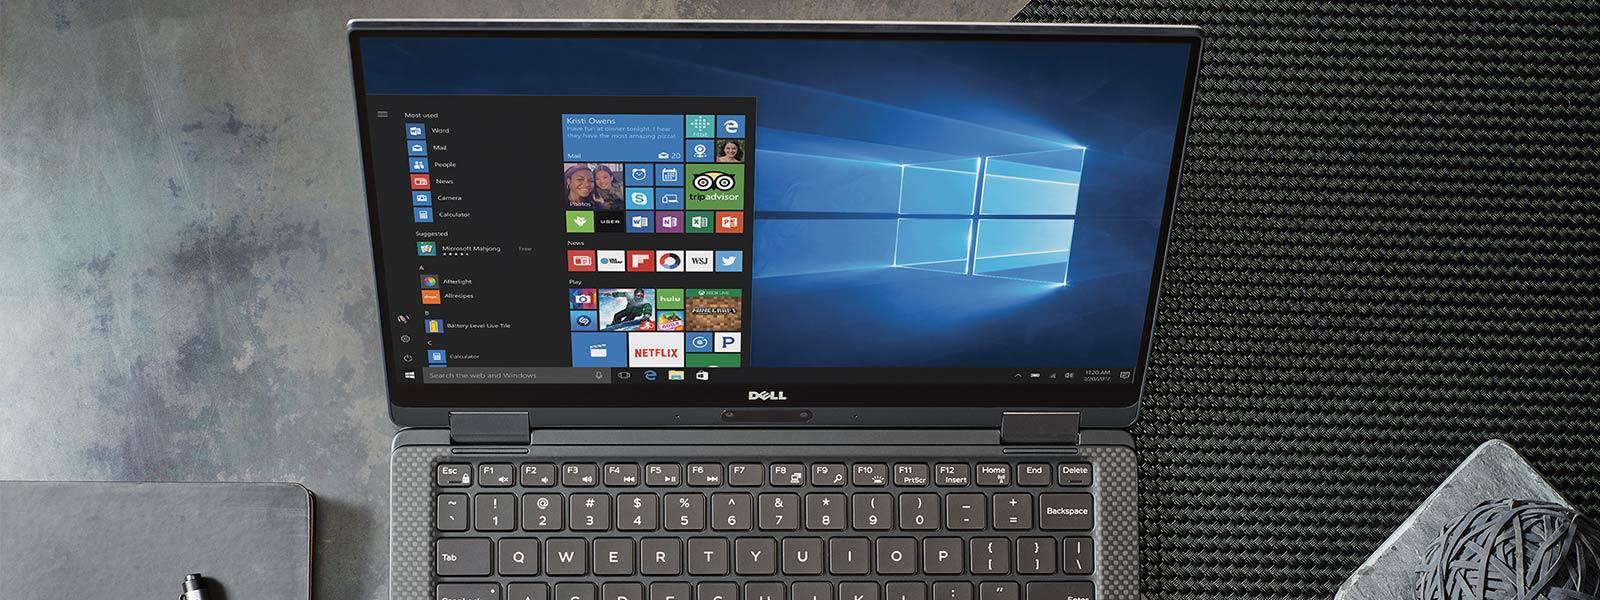 Windows 10 시작 화면이 표시되어 있는 장치